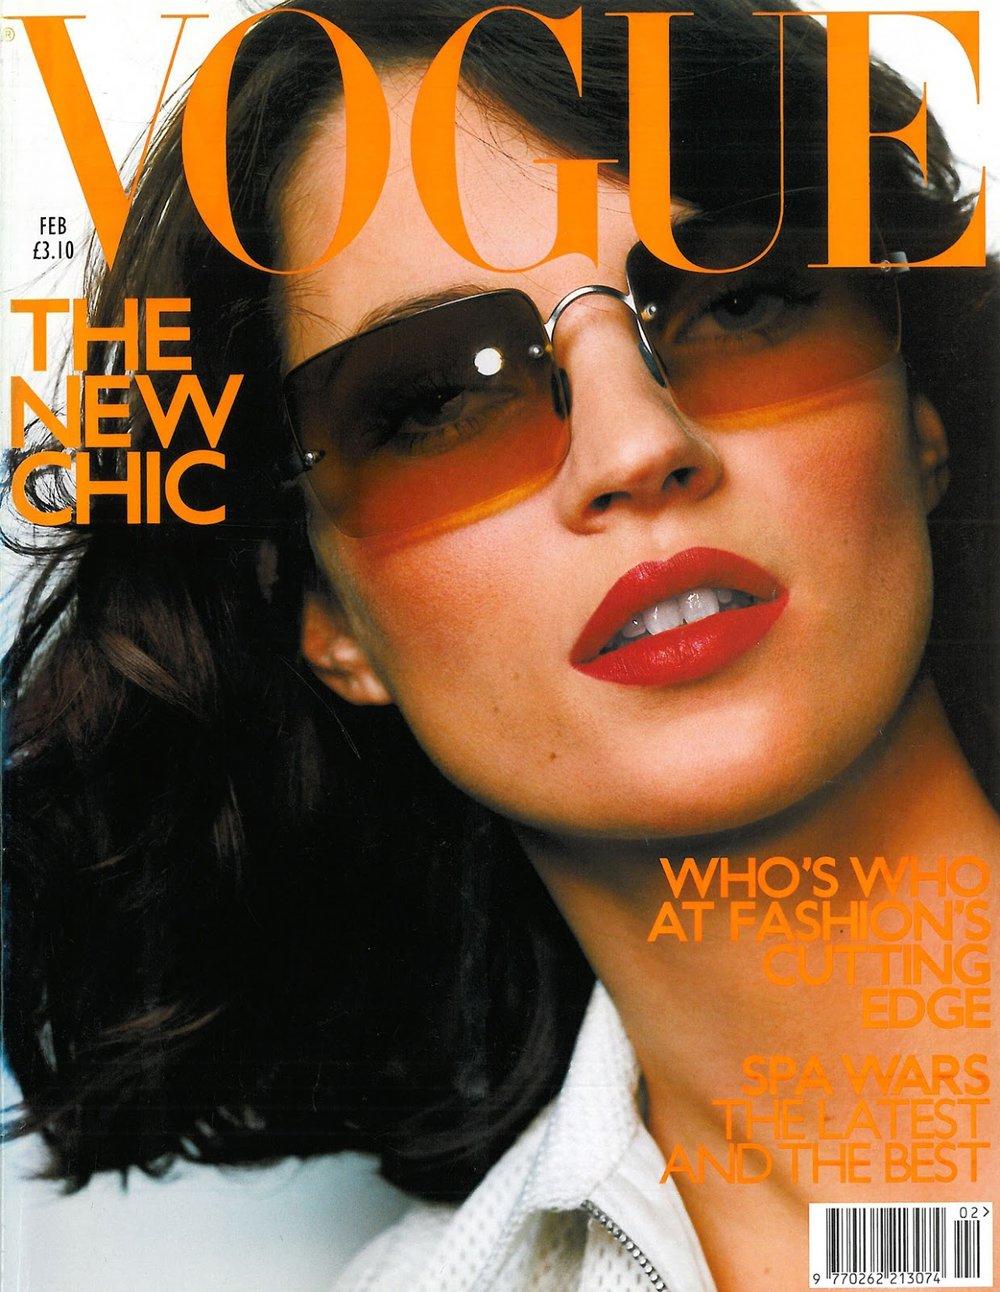 Vogue Brazil February 2000